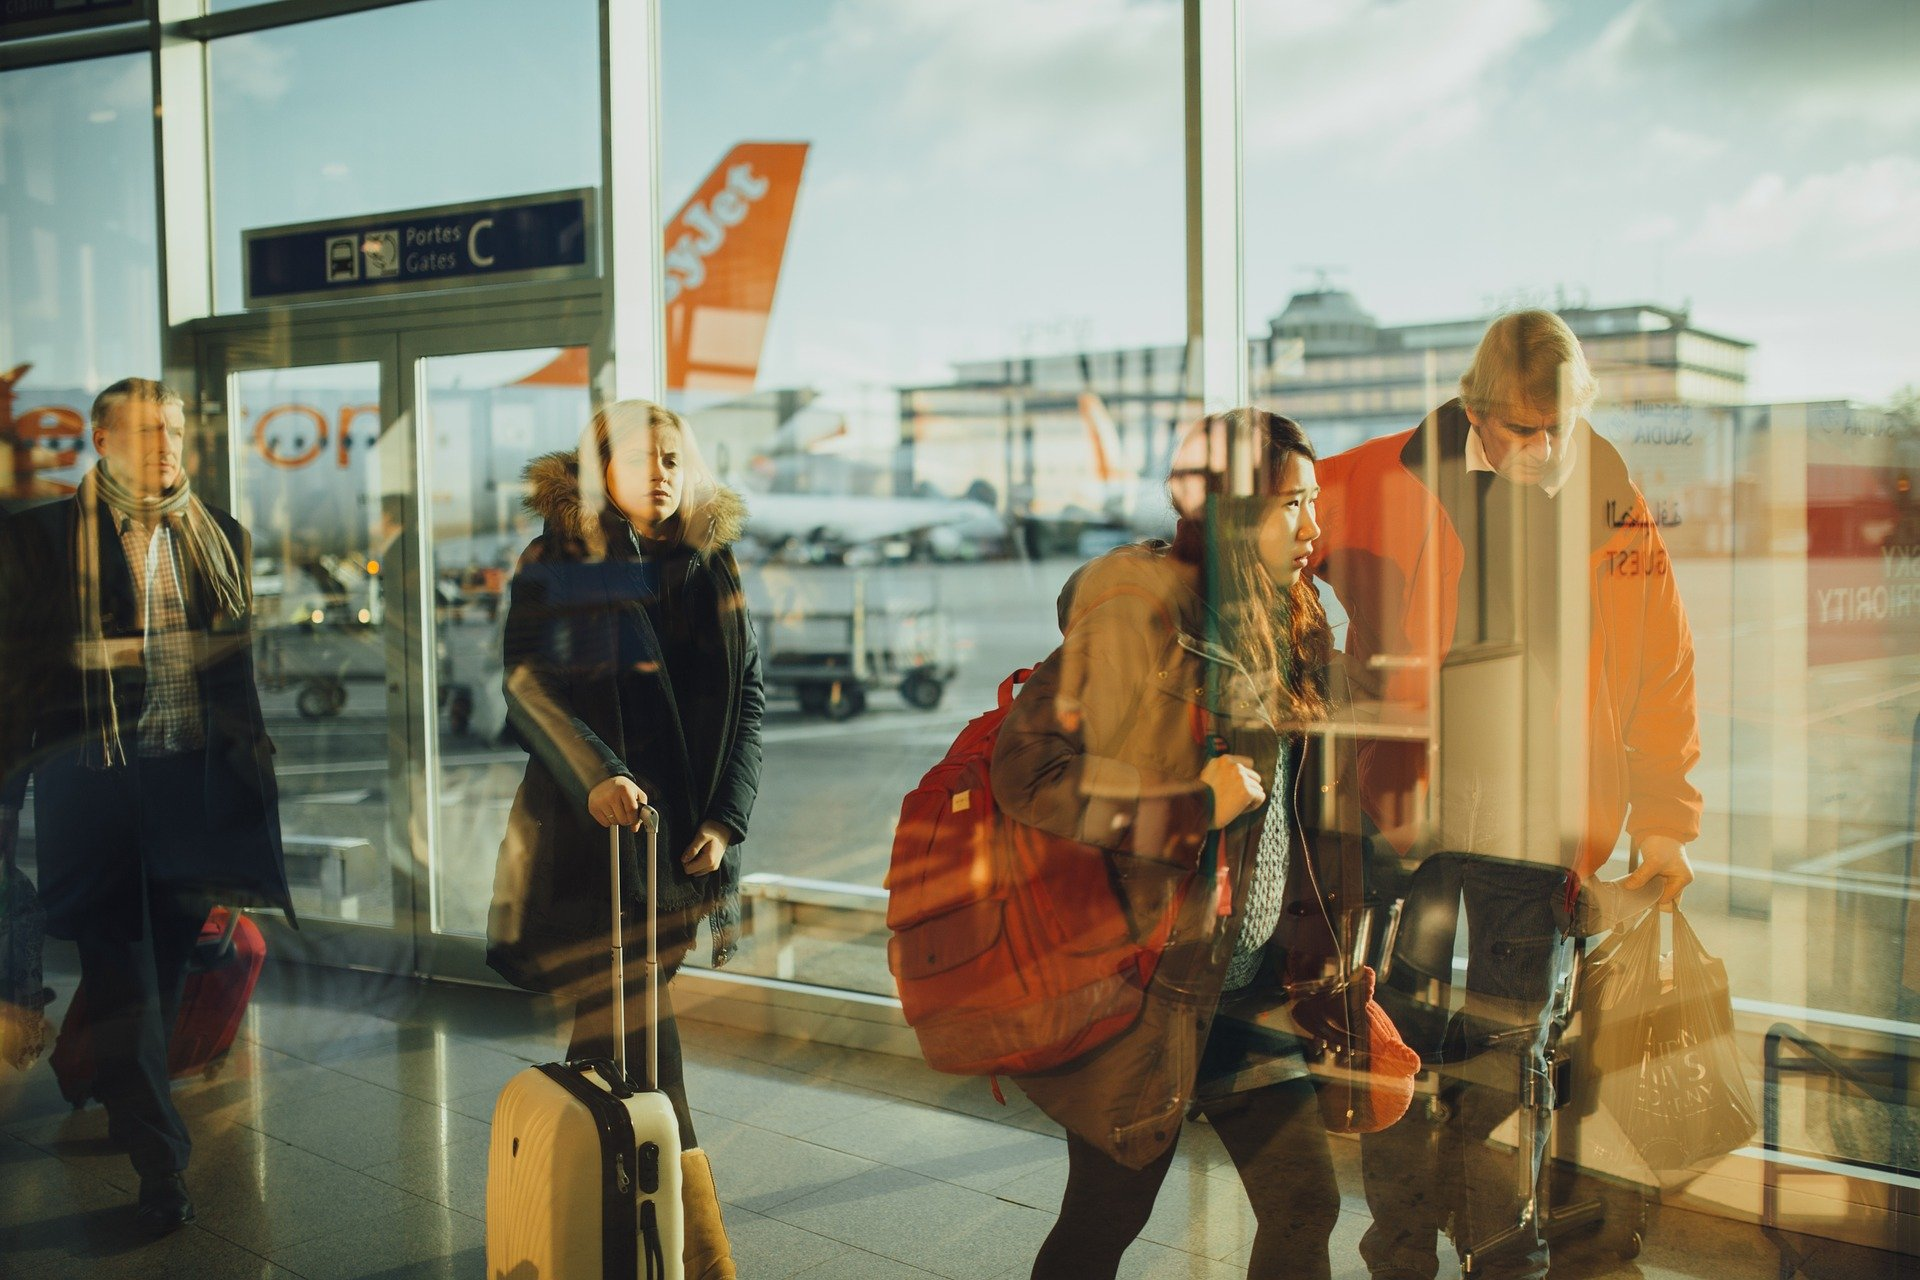 Luggage Storage Options While Traveling